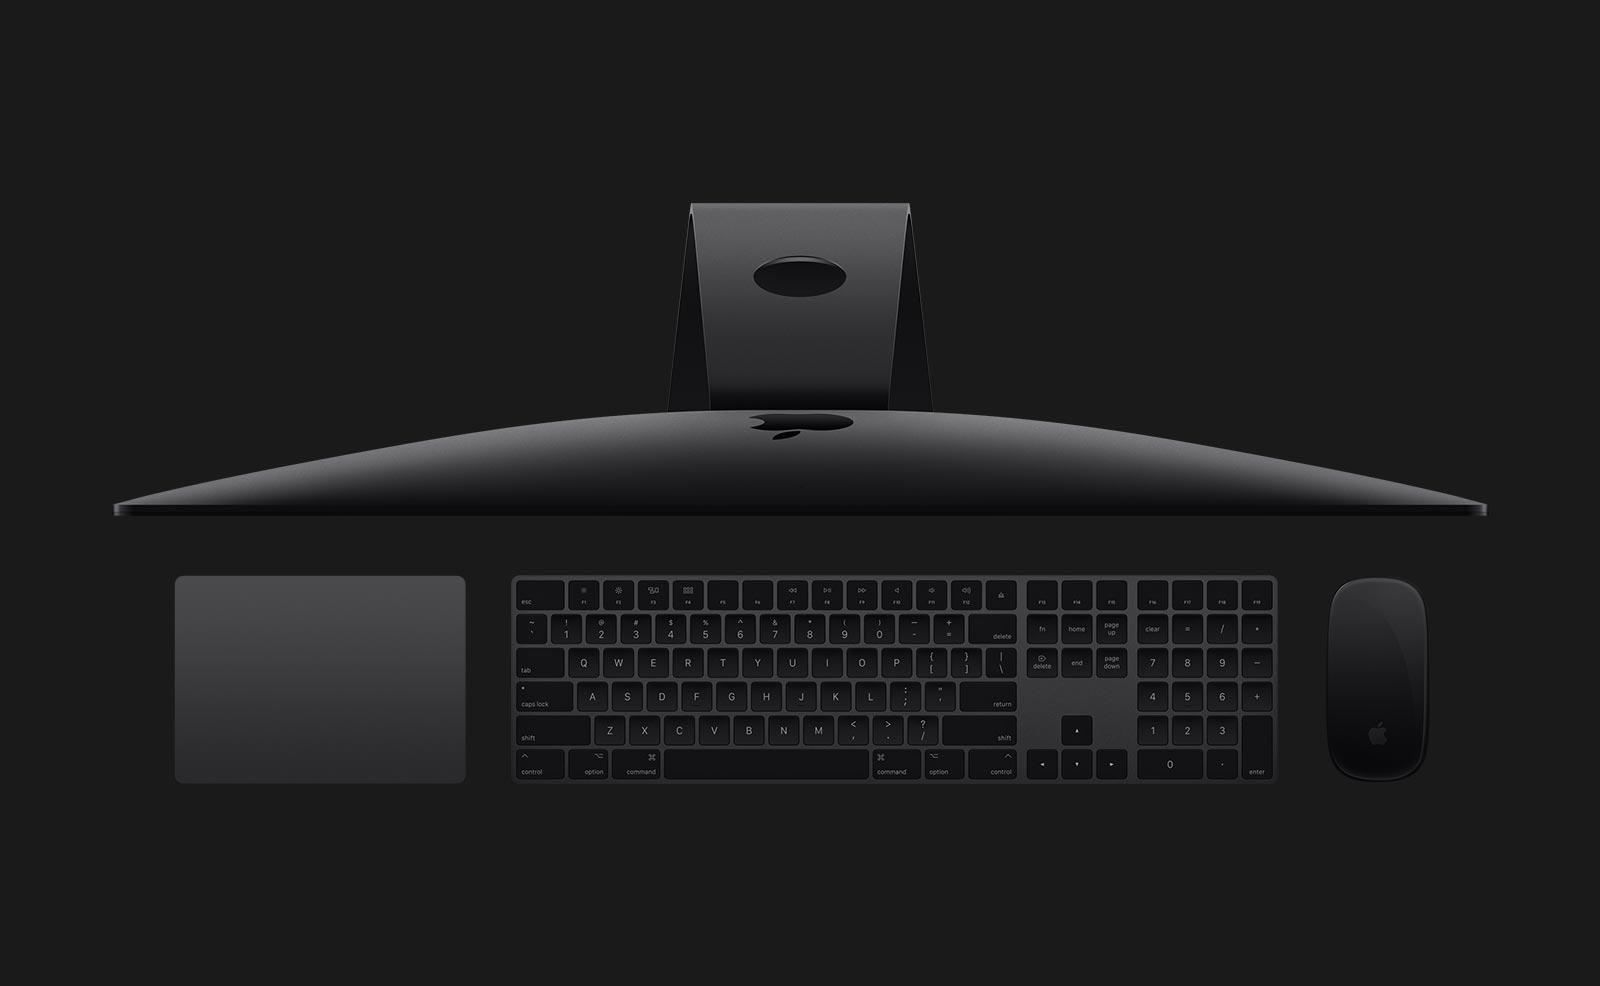 iMac Pro Accesorries side